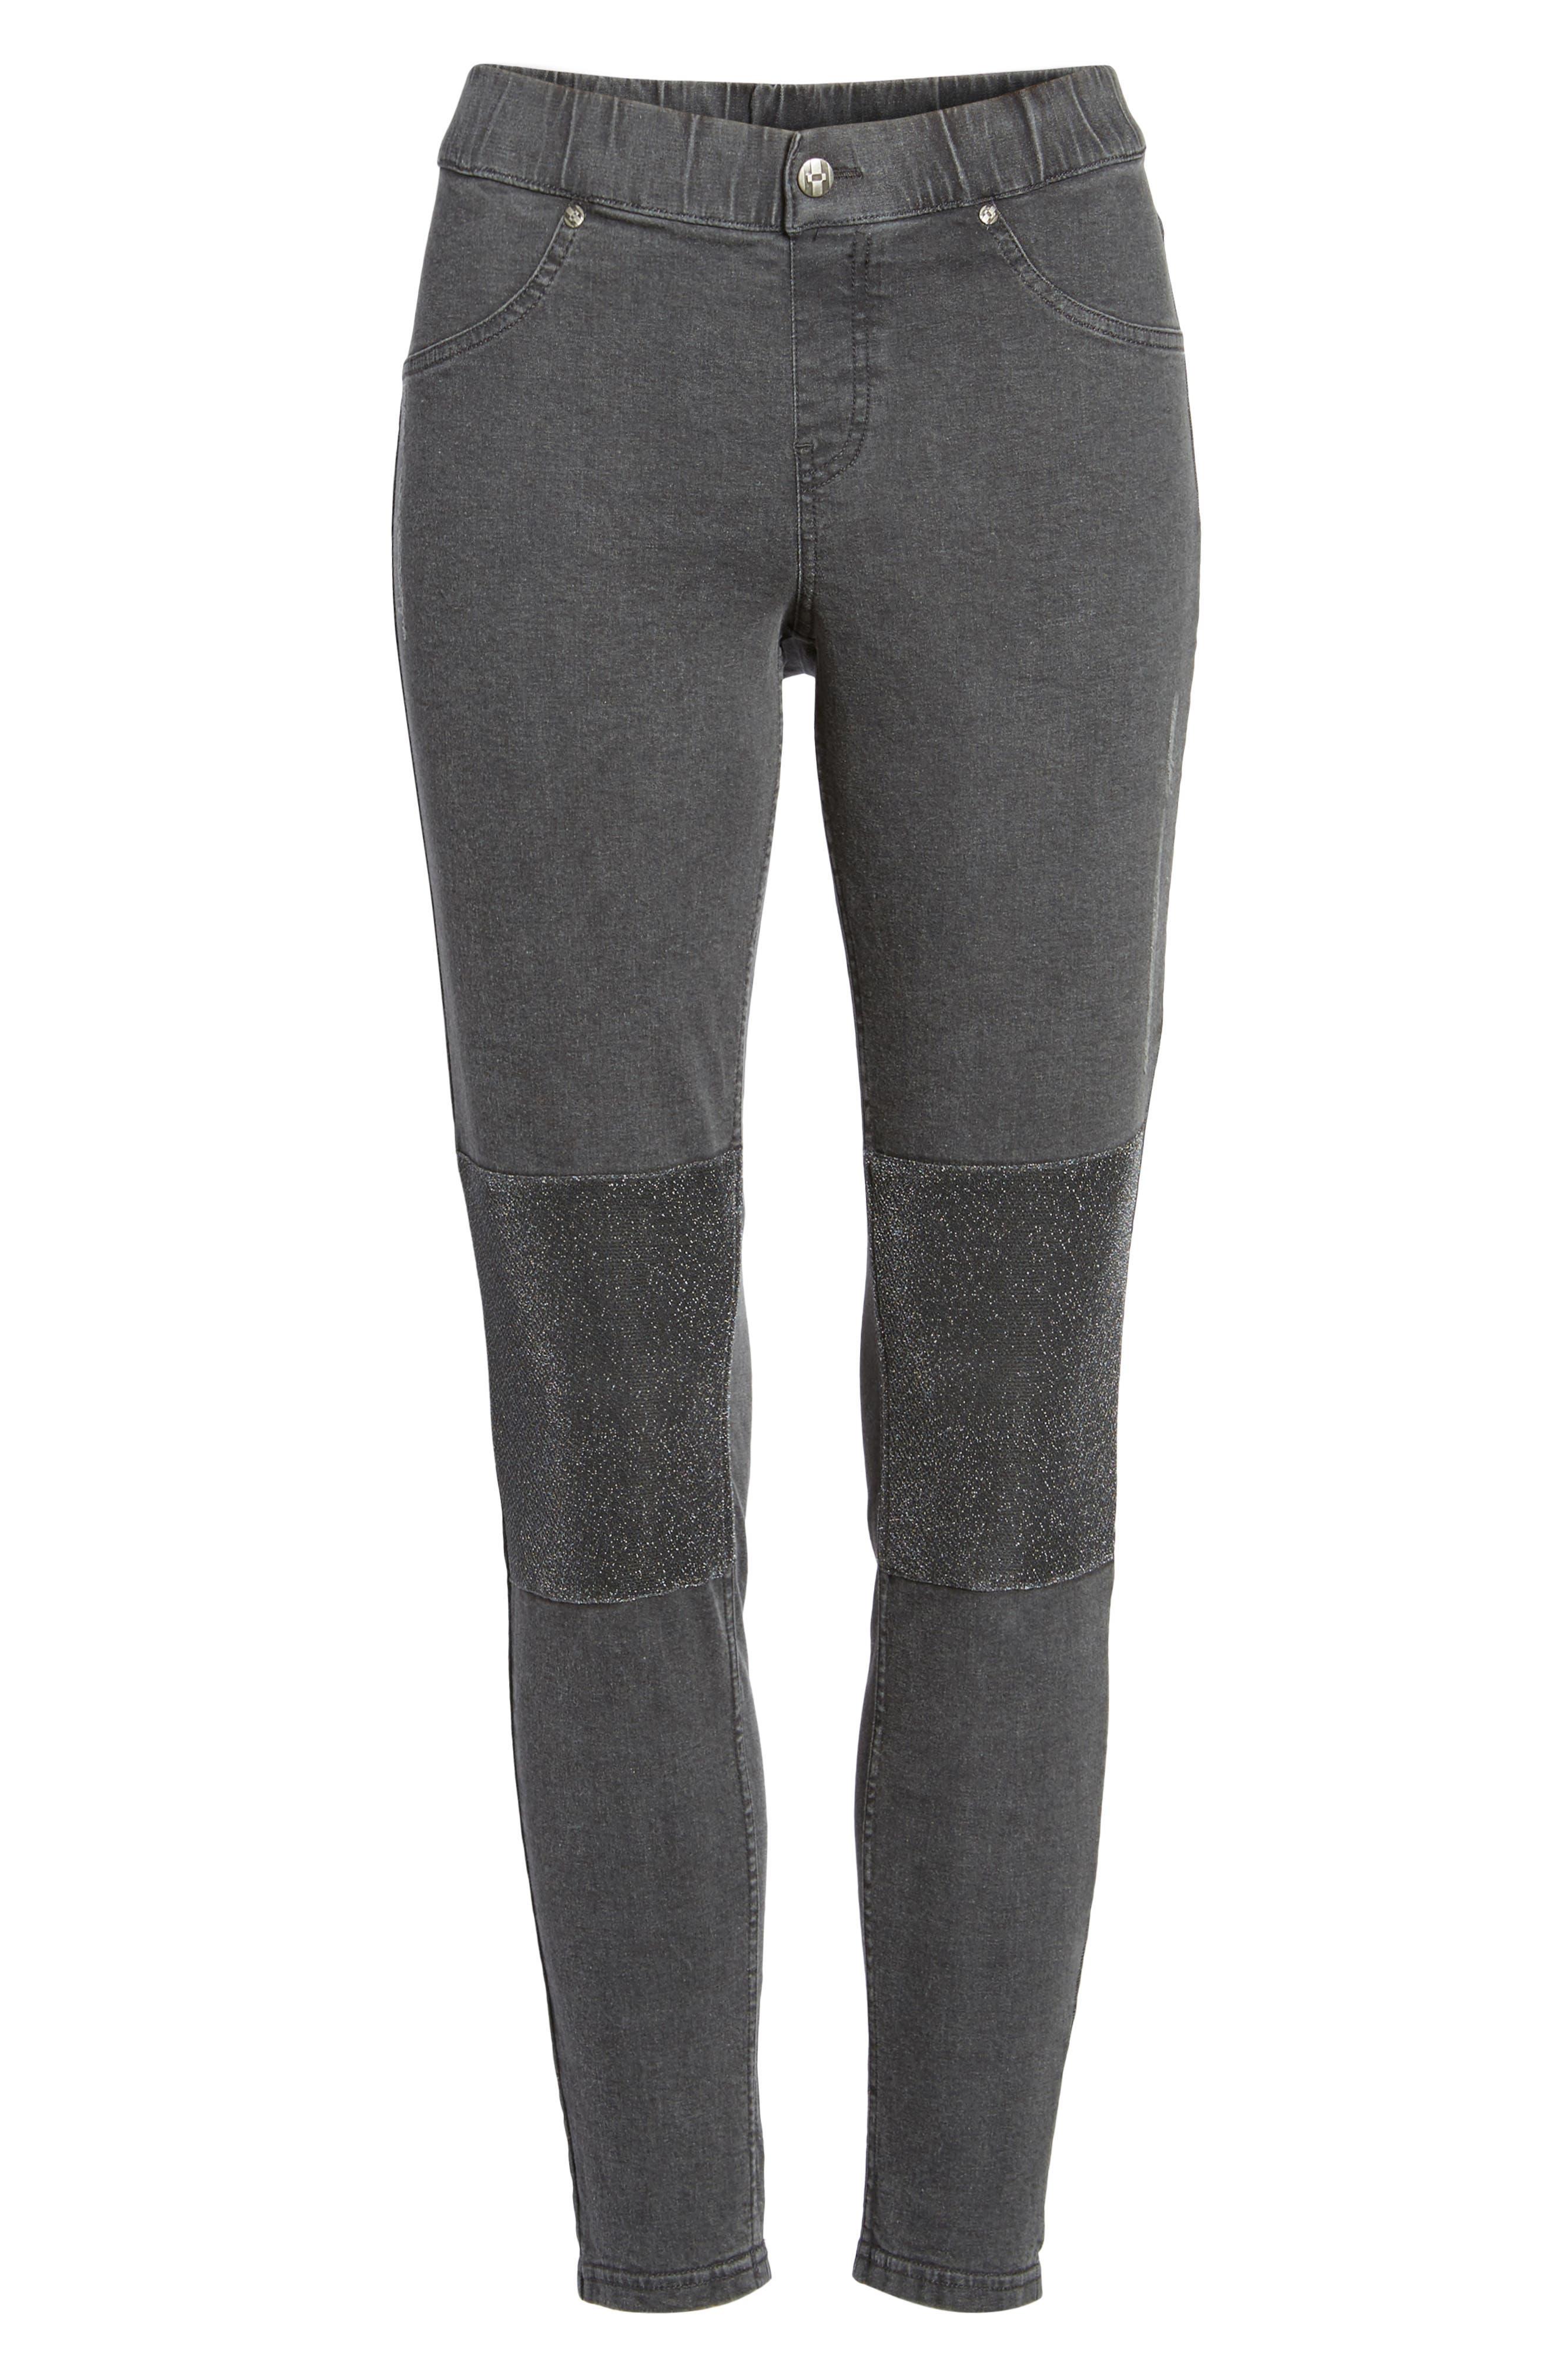 Metallic Knee Patch Denim Skimmer Leggings,                             Alternate thumbnail 6, color,                             Graphite Wash